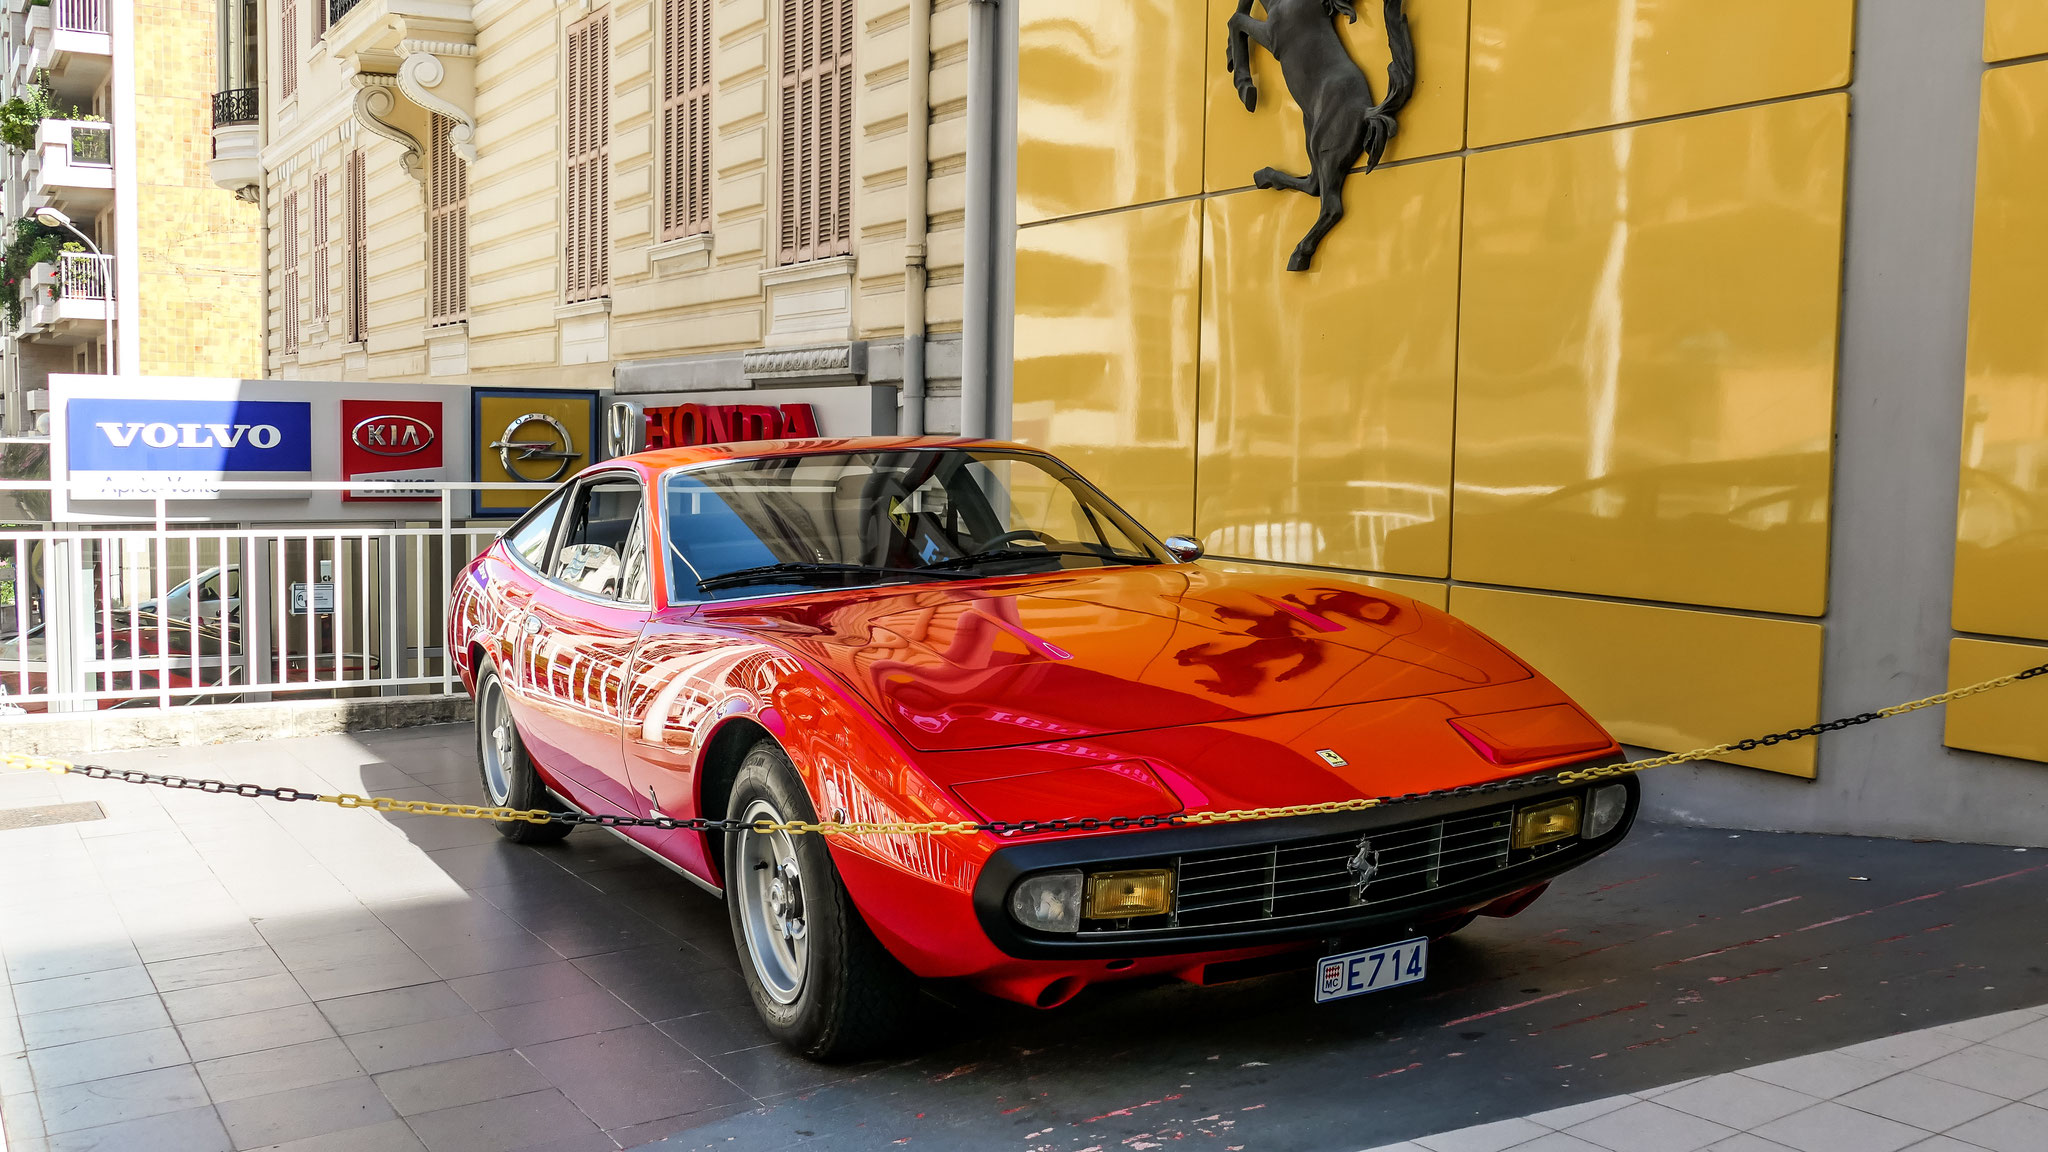 Ferrari 365 GTC4 - E714 (MC)